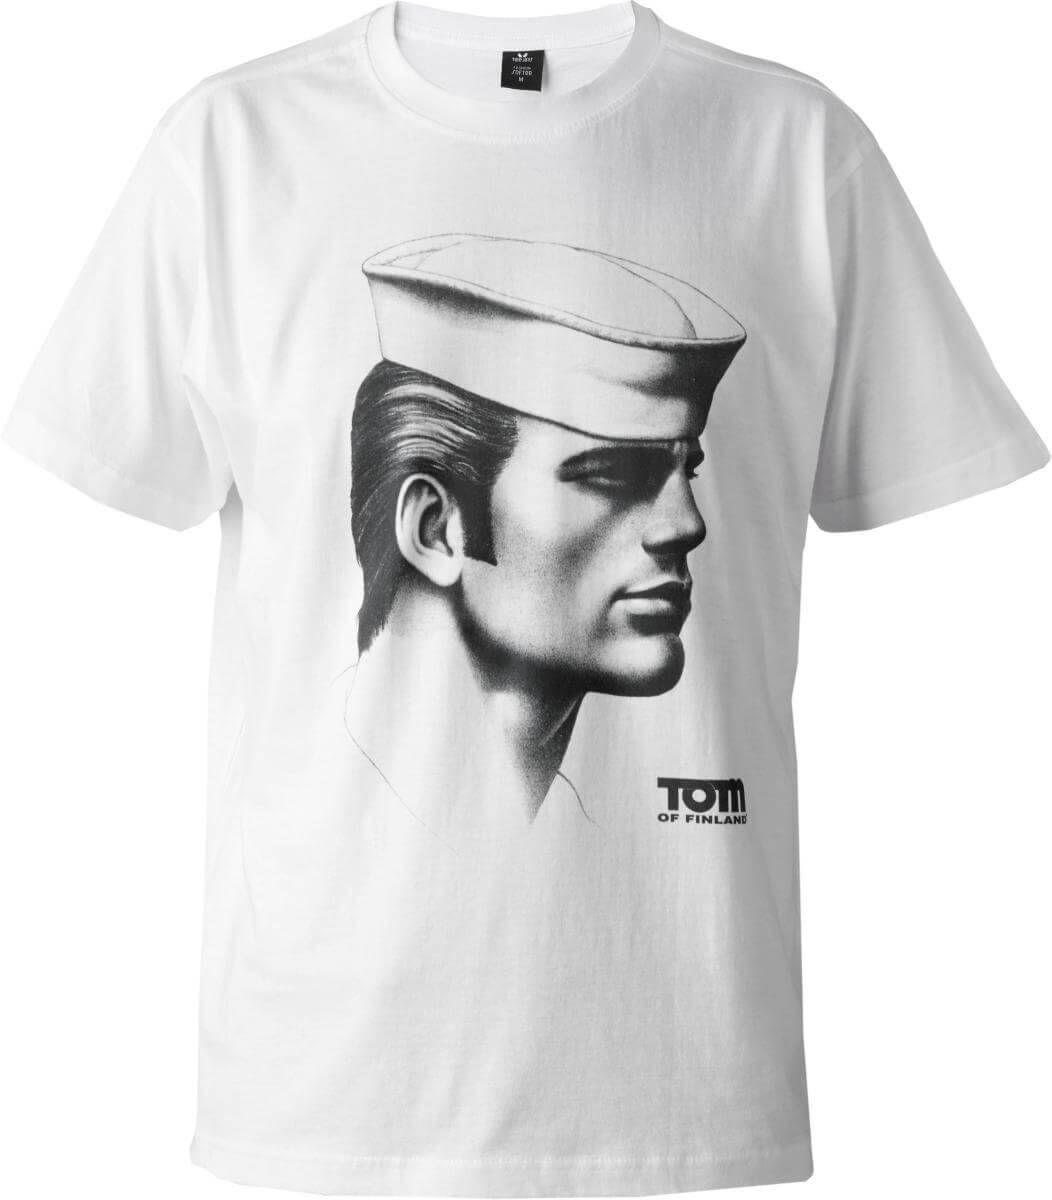 Tom of Finland Sailor t-shirt - Finlayson webstore